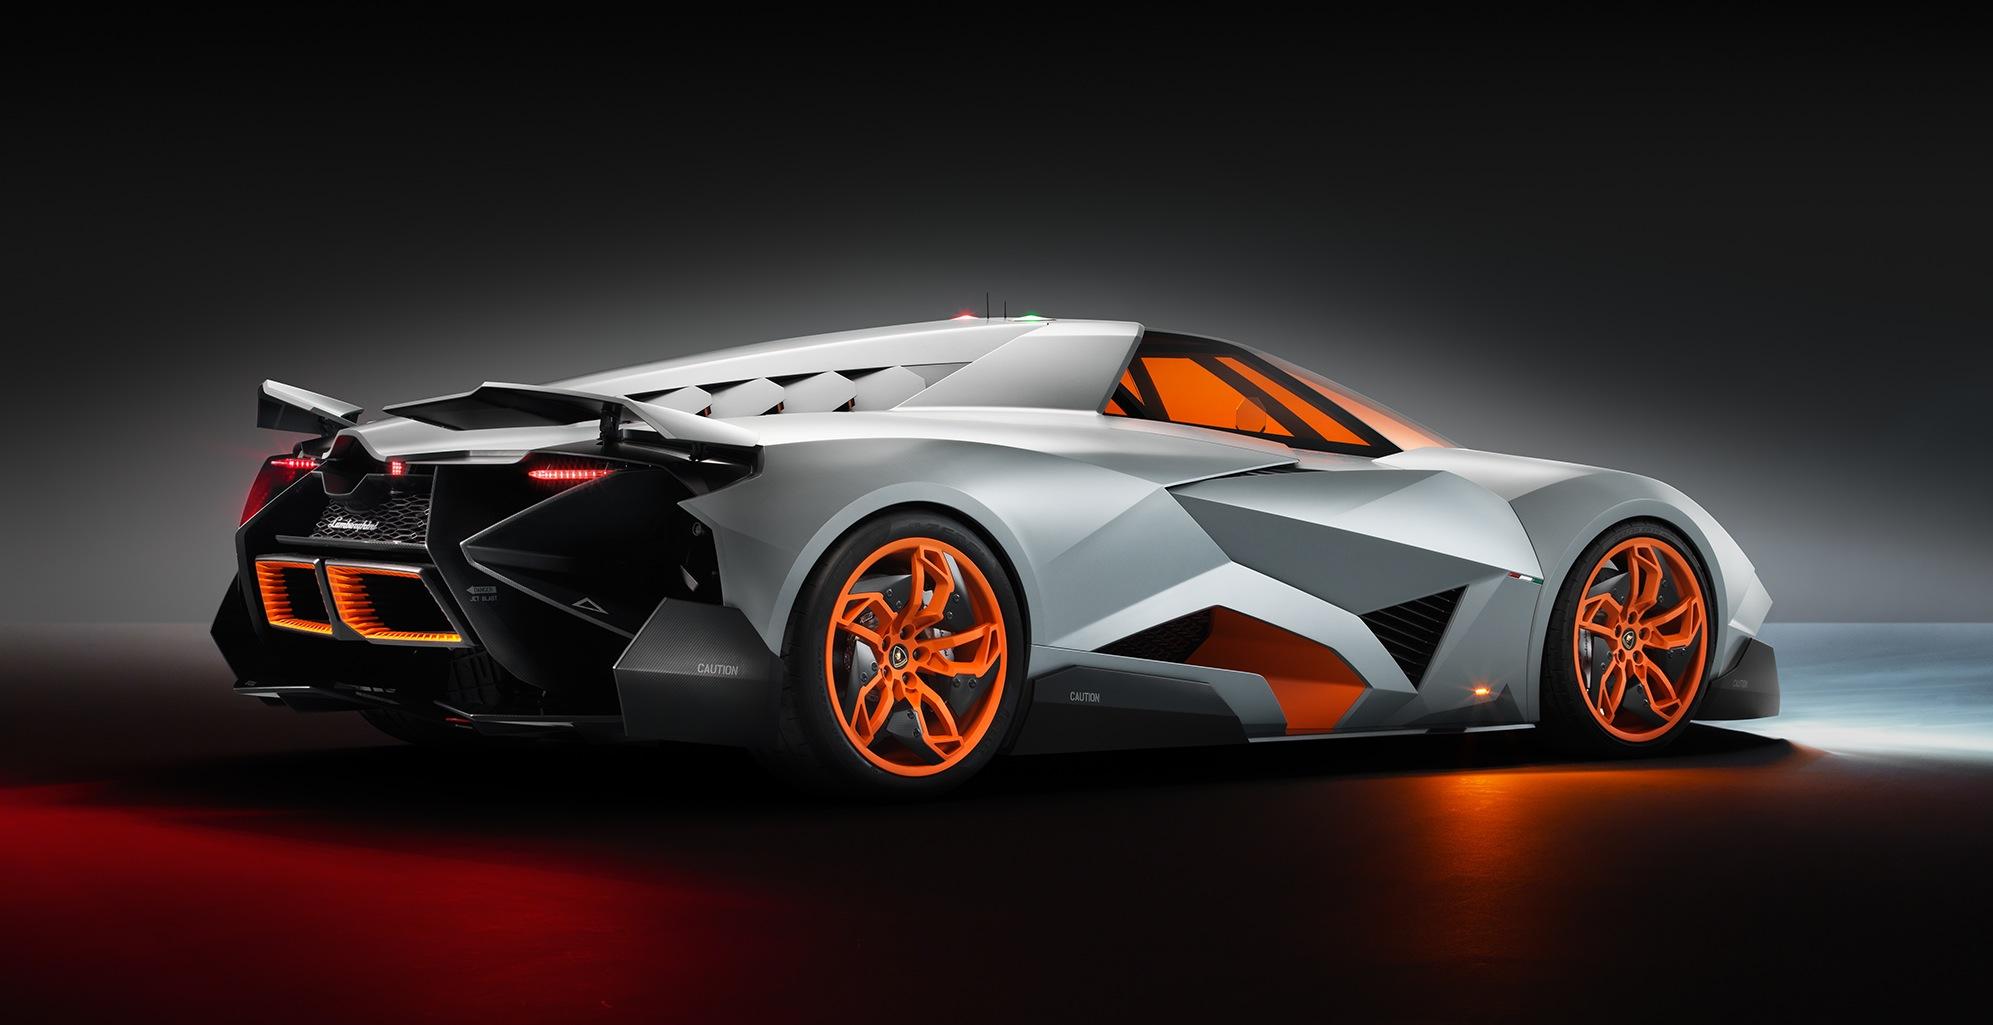 Egoista Super Car Price